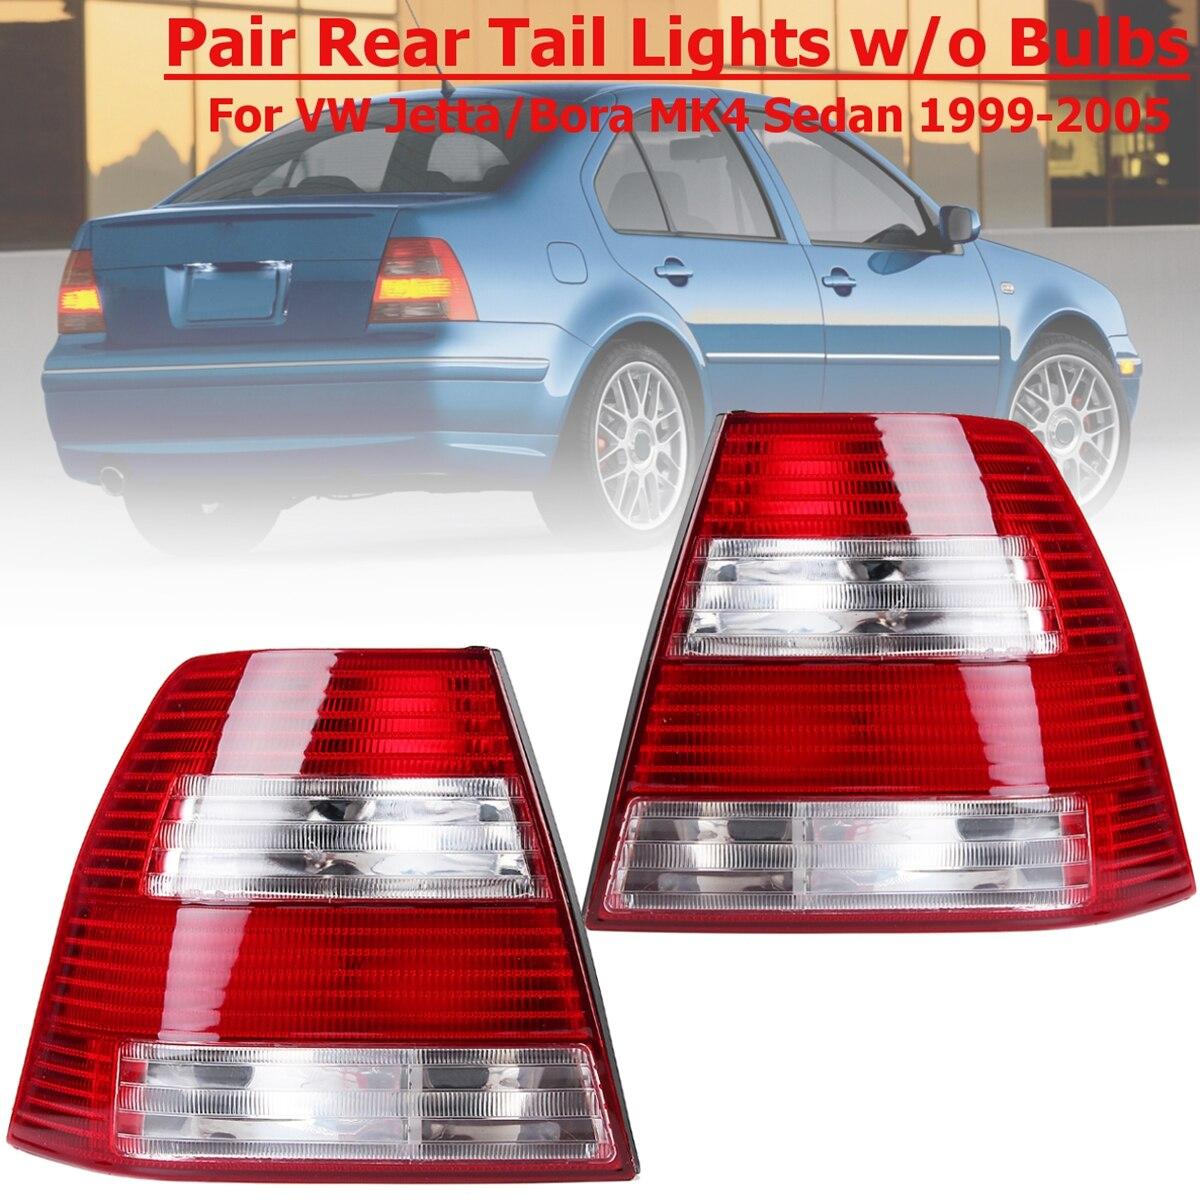 1 пара тормозной фонарь задний красный задние фонари для Volkswagen Jetta для VW Jetta Бора MK4 IV седан 1999 2000 2001 2002 2003 2004 2005